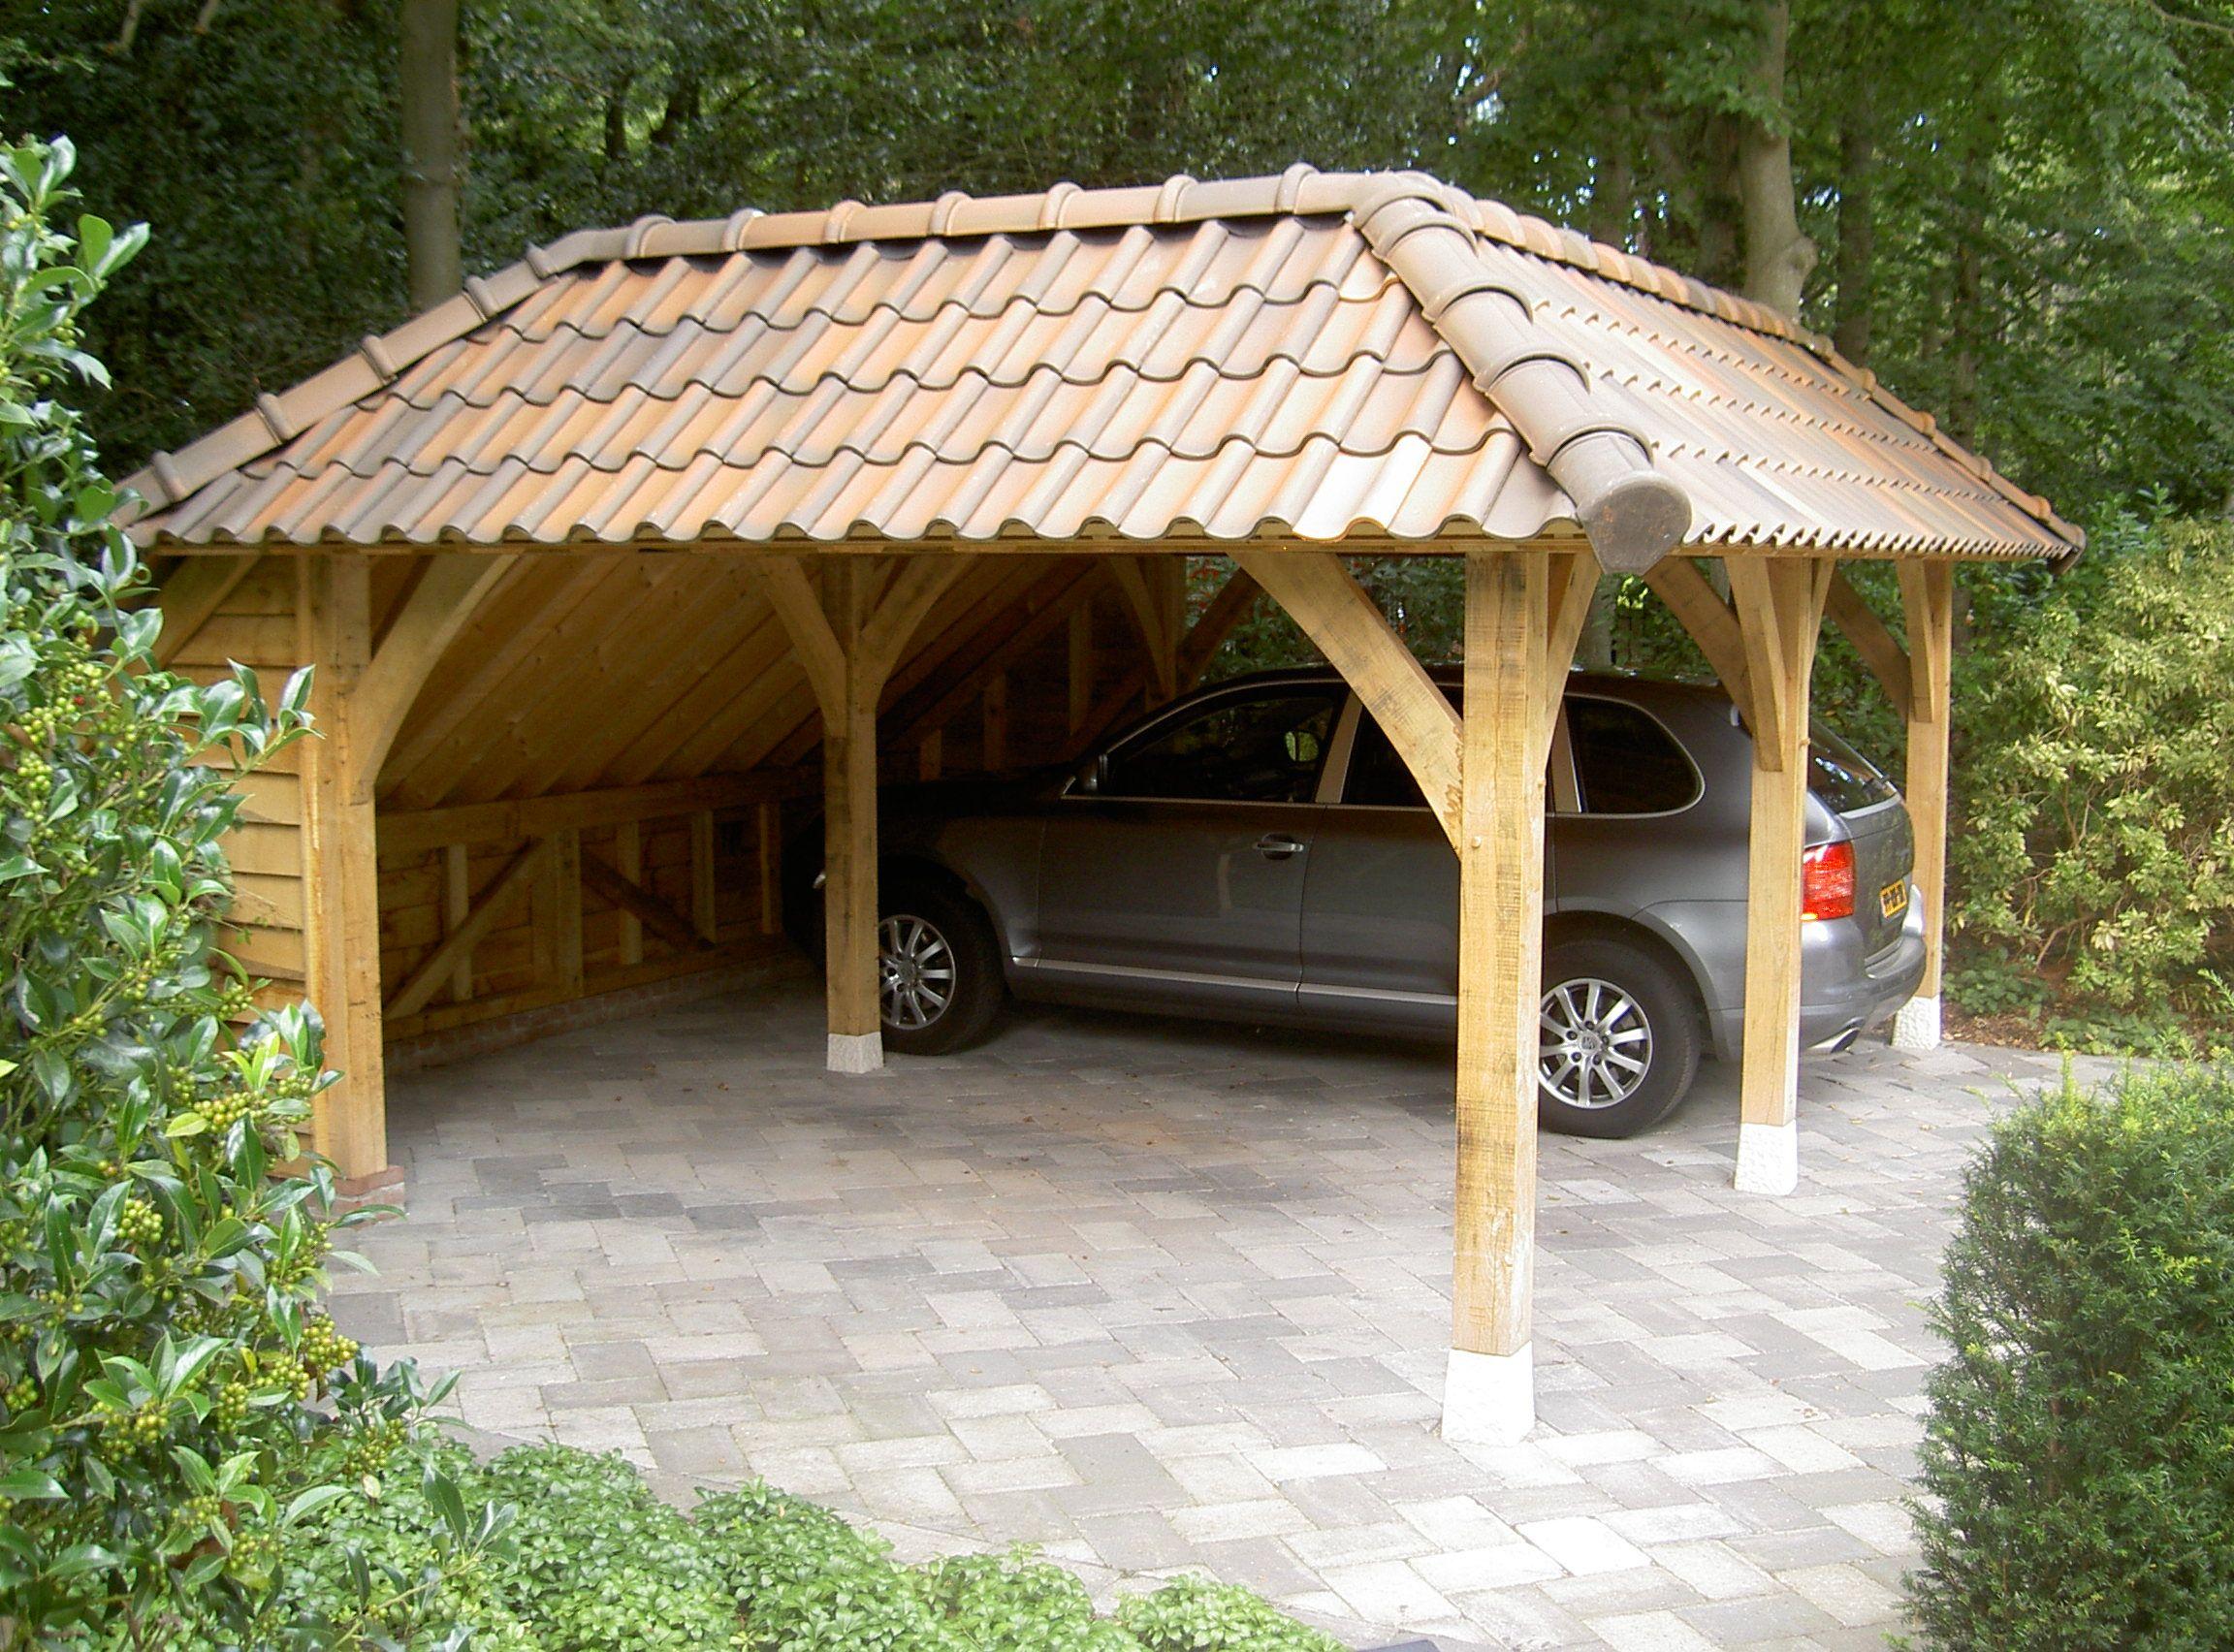 eiken duurzaam eikenhout eikenhouten bijgebouw bijgebouwen. Black Bedroom Furniture Sets. Home Design Ideas